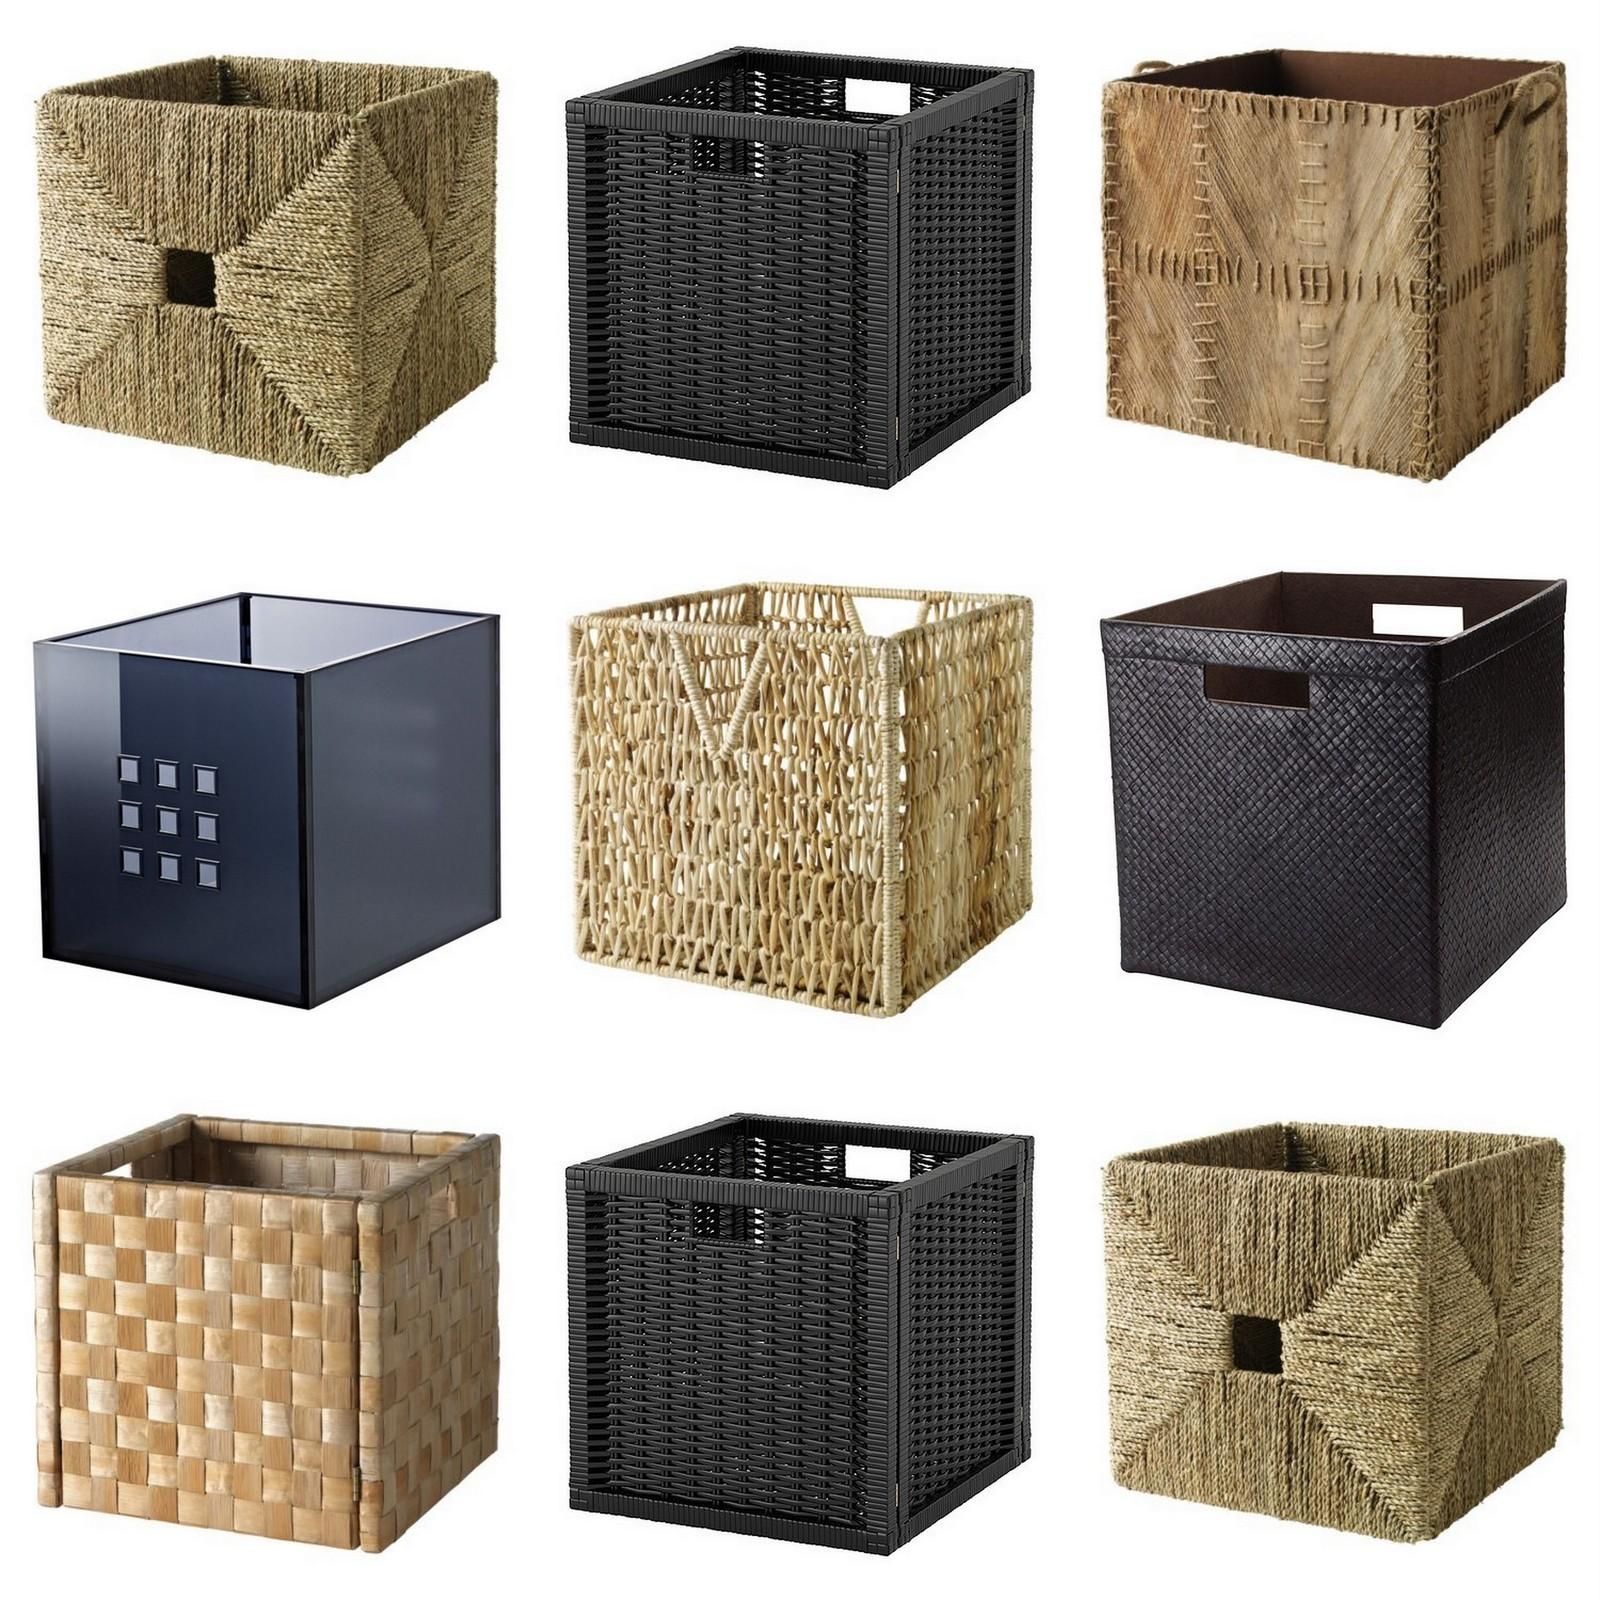 Ikea Expedit Kitchen: IKEA Baskets In The Kitchen